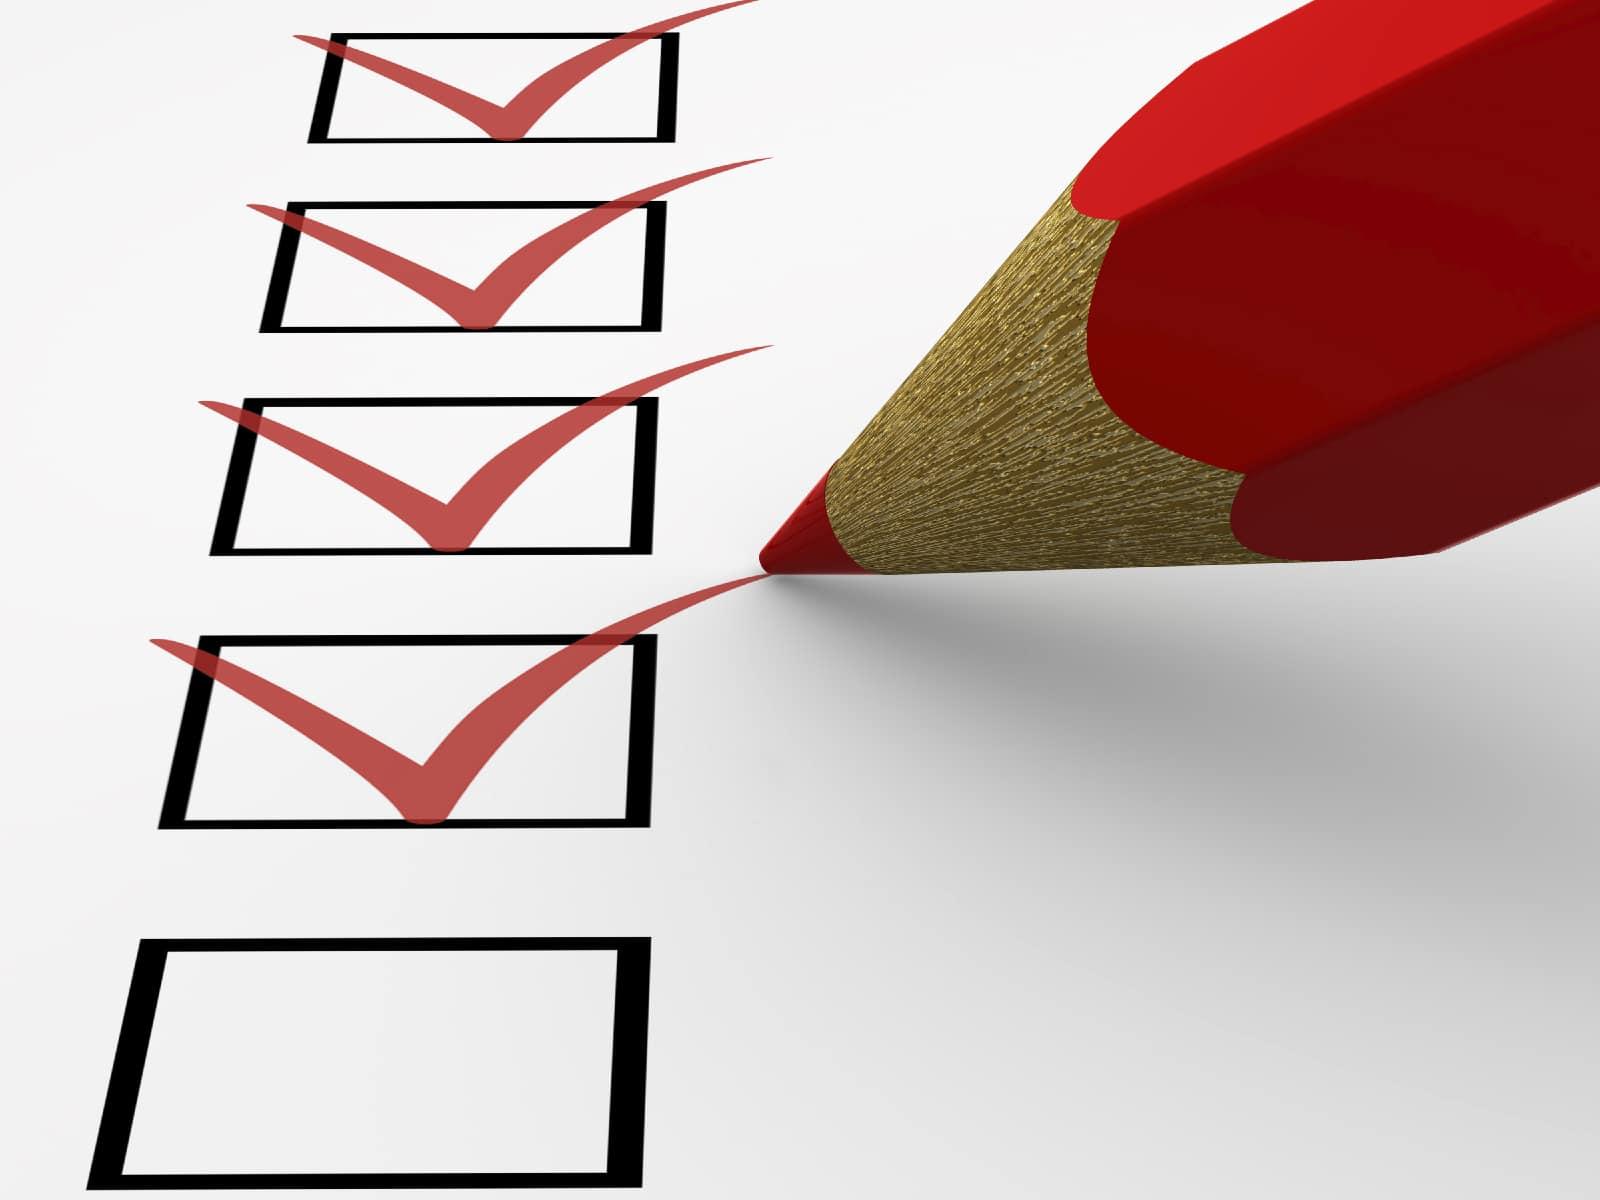 checklist for tax saving 2015-16